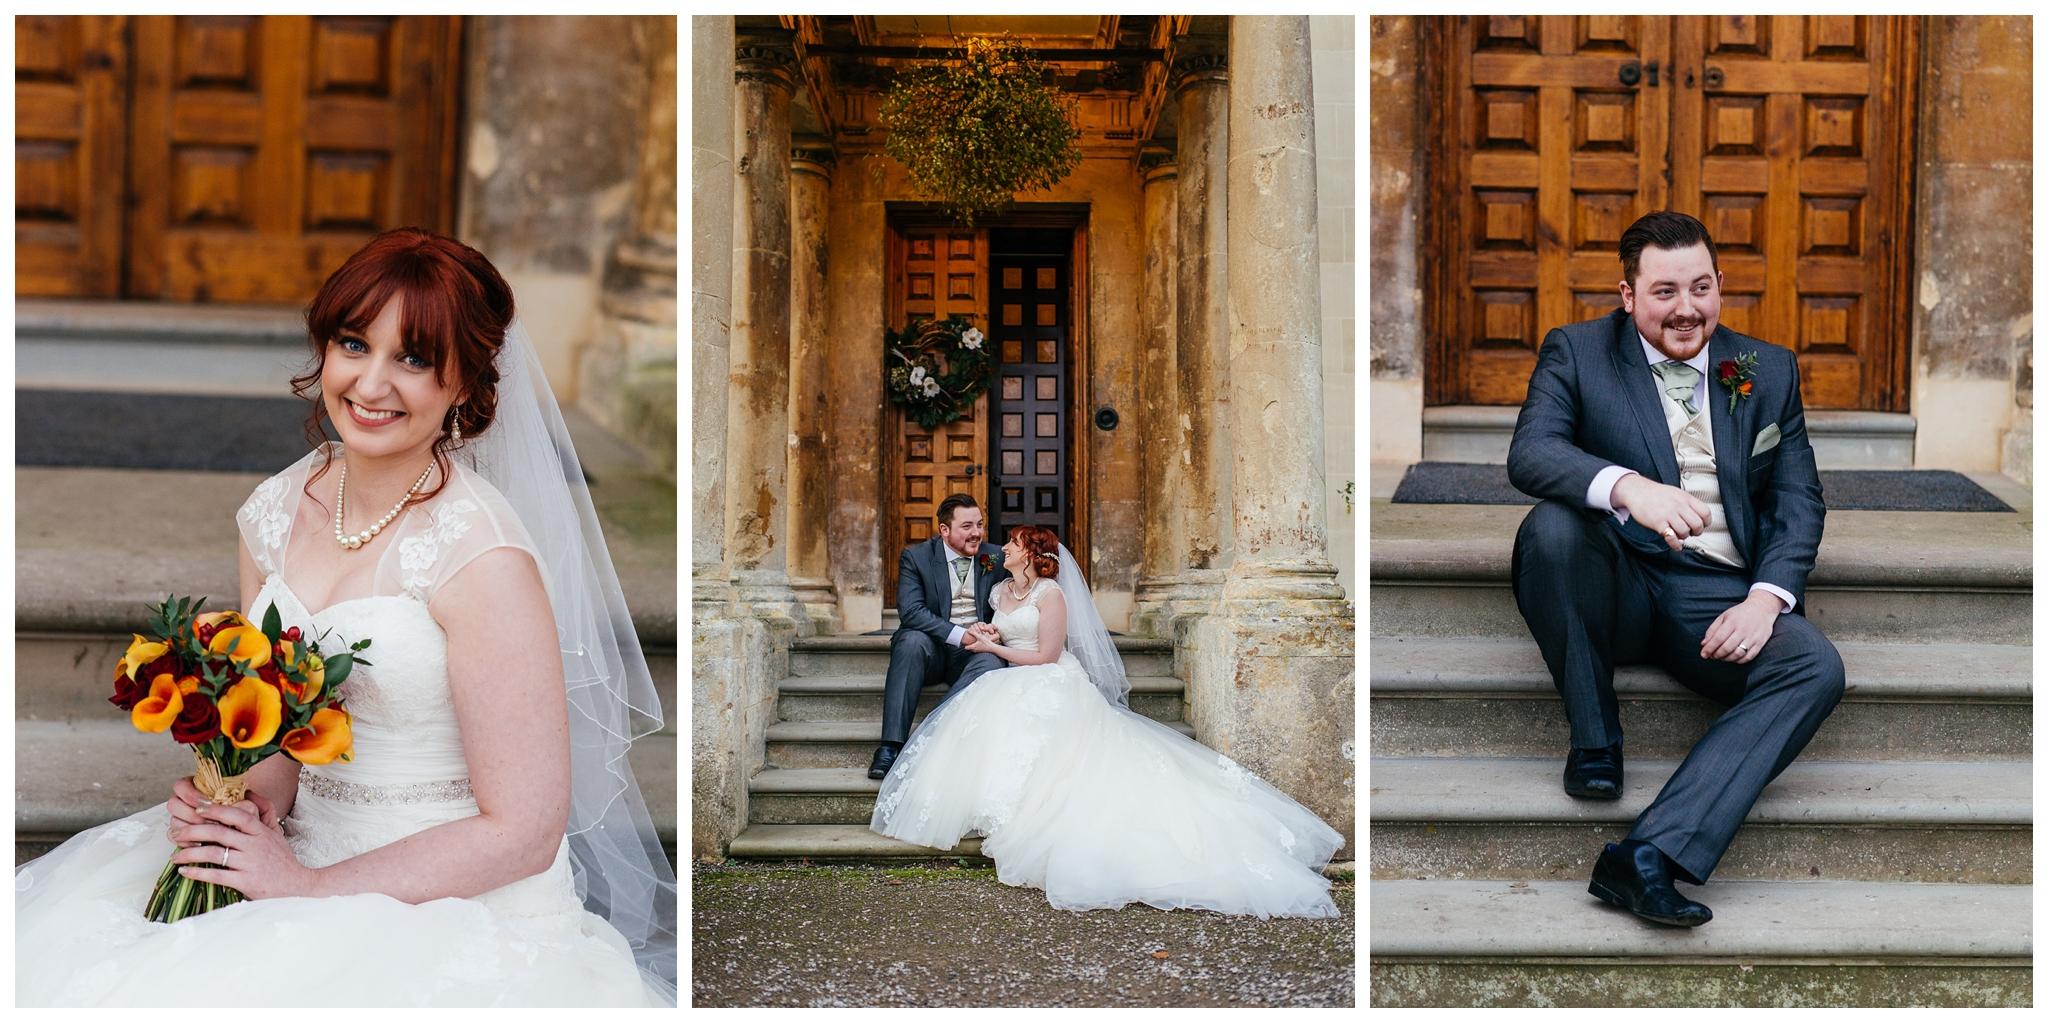 Emma&Paul-Elmore-Court-Winter-Wedding-Nikki-Cooper-Photography_0072.jpg